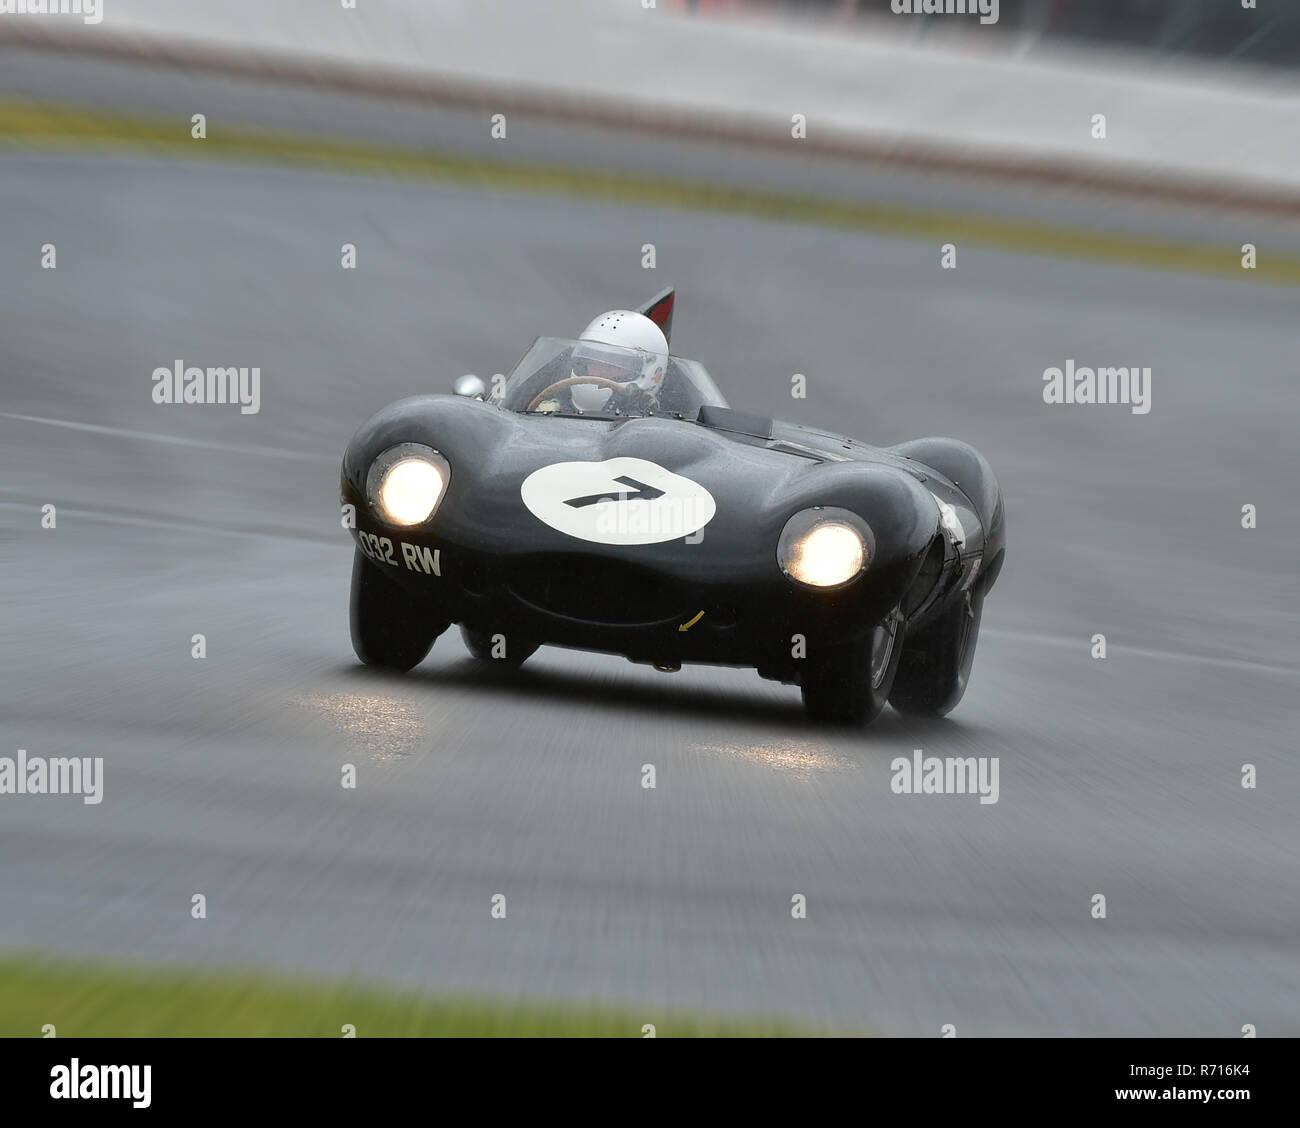 Gary Pearson, Jaguar D-Type, 032 RW, RAC Woodcote Trophy, Silverstone Classic 2015, Chris McEvoy, circuit racing, cjm-photography, classic cars, Class - Stock Image